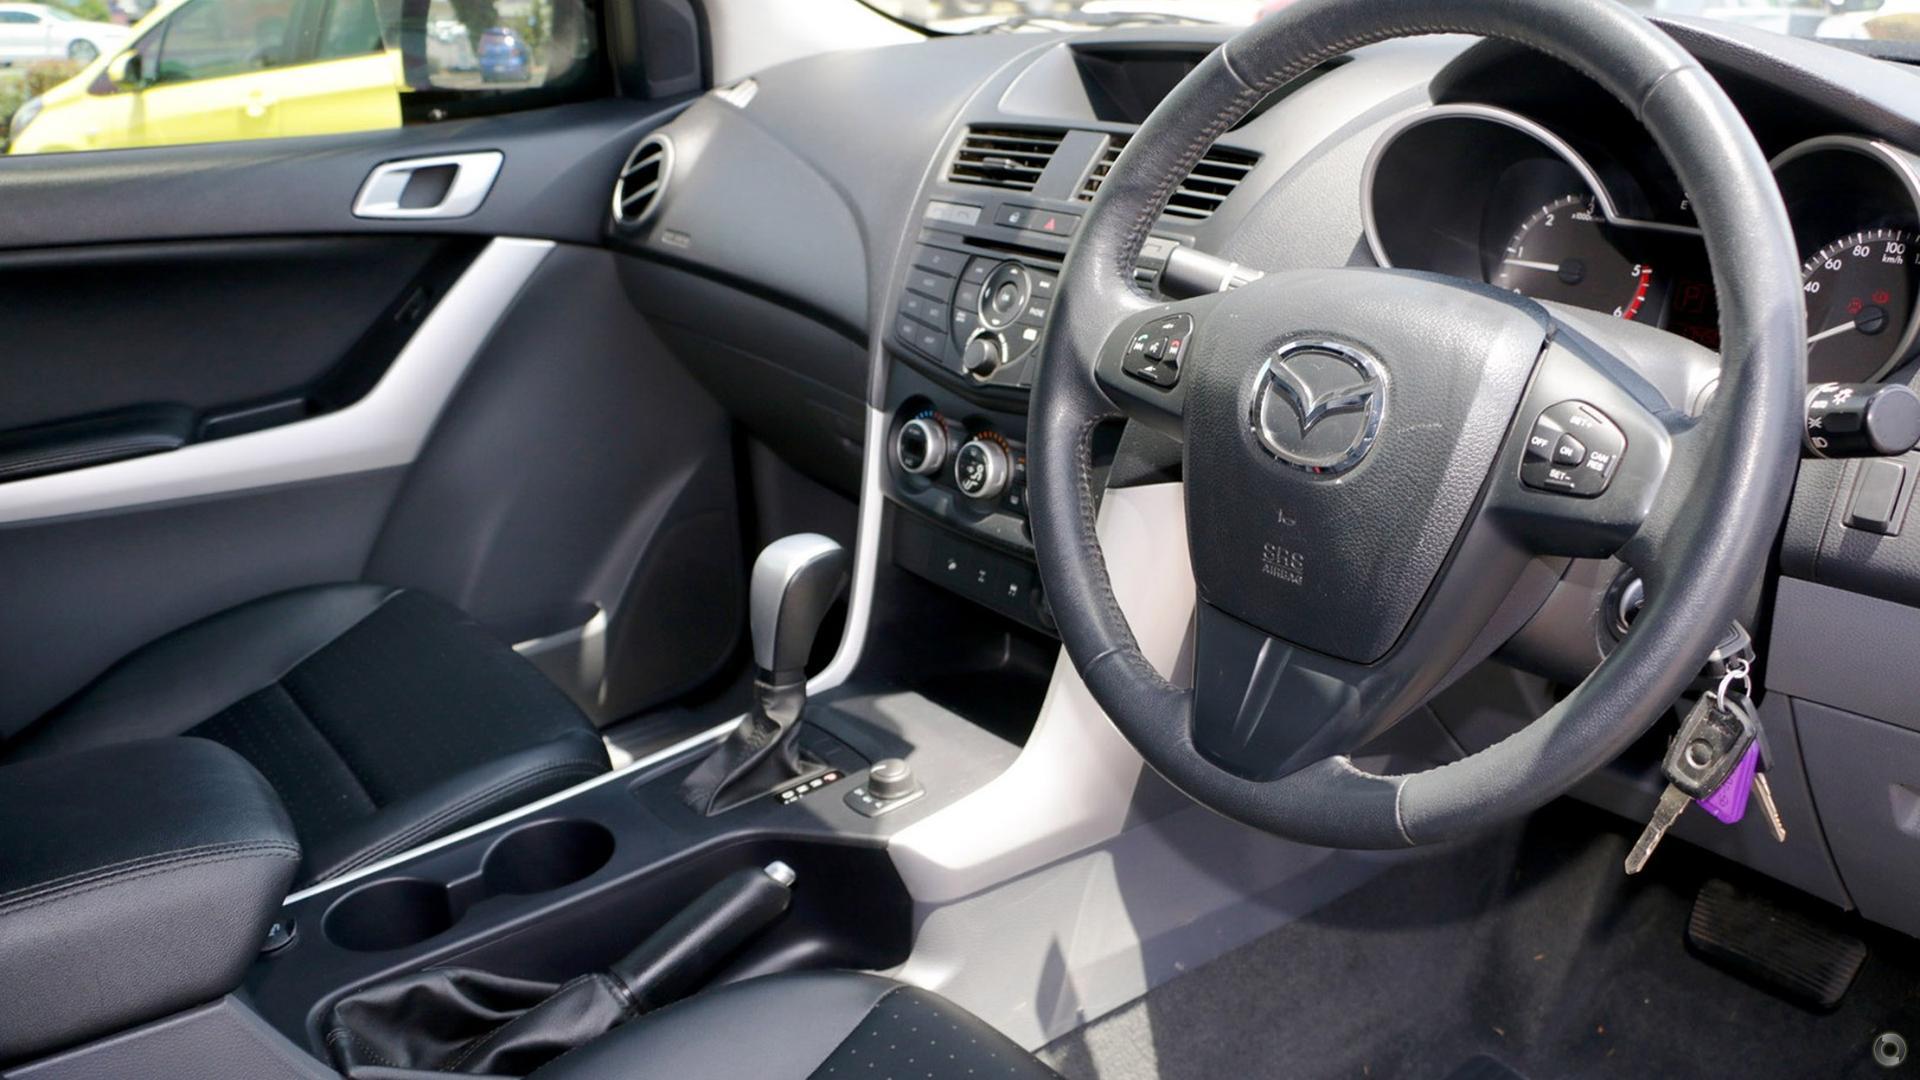 2012 Mazda Bt-50 GT UP